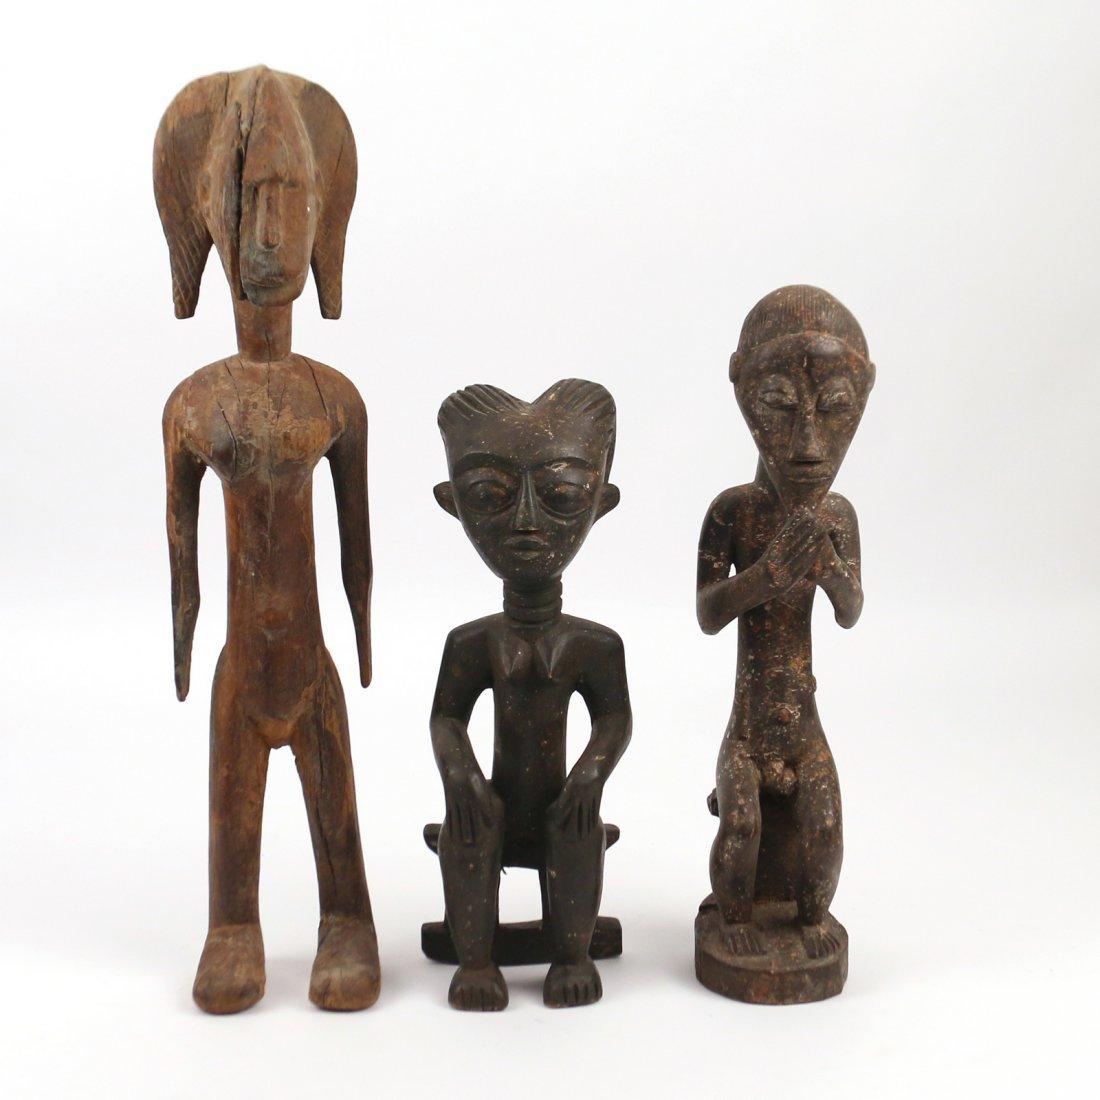 (3pc) AFRICAN ANTIQUE WOODEN SCULPTURE